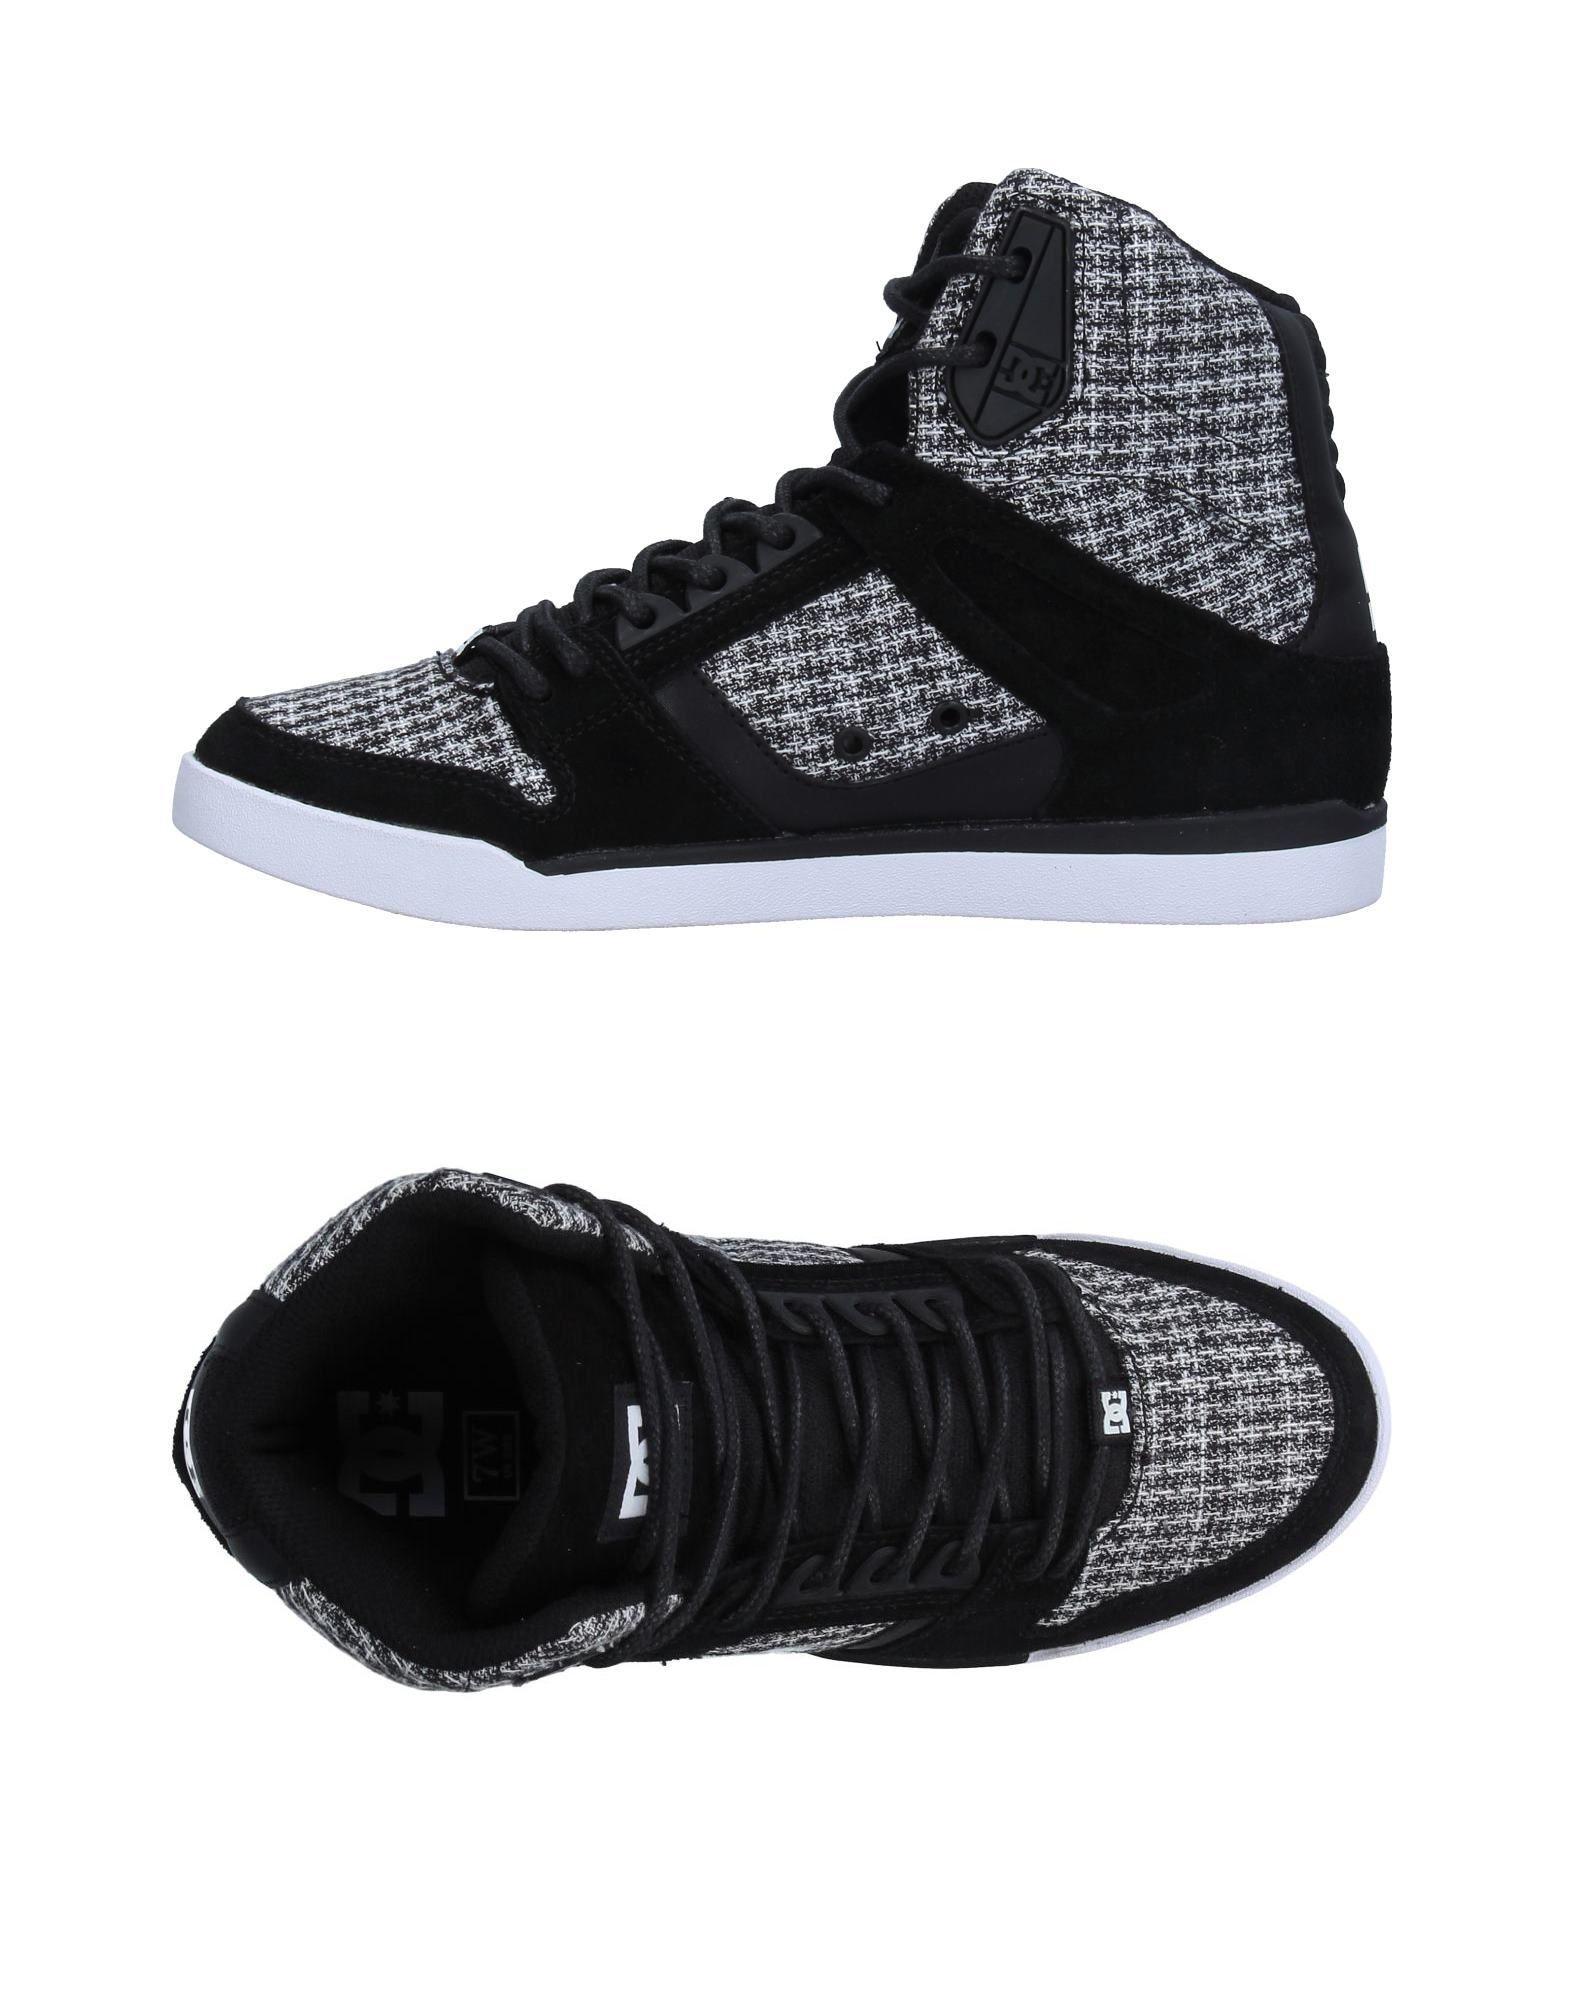 DC SHOECOUSA Высокие кеды и кроссовки кеды кроссовки высокие женские dc rebound hi chambray